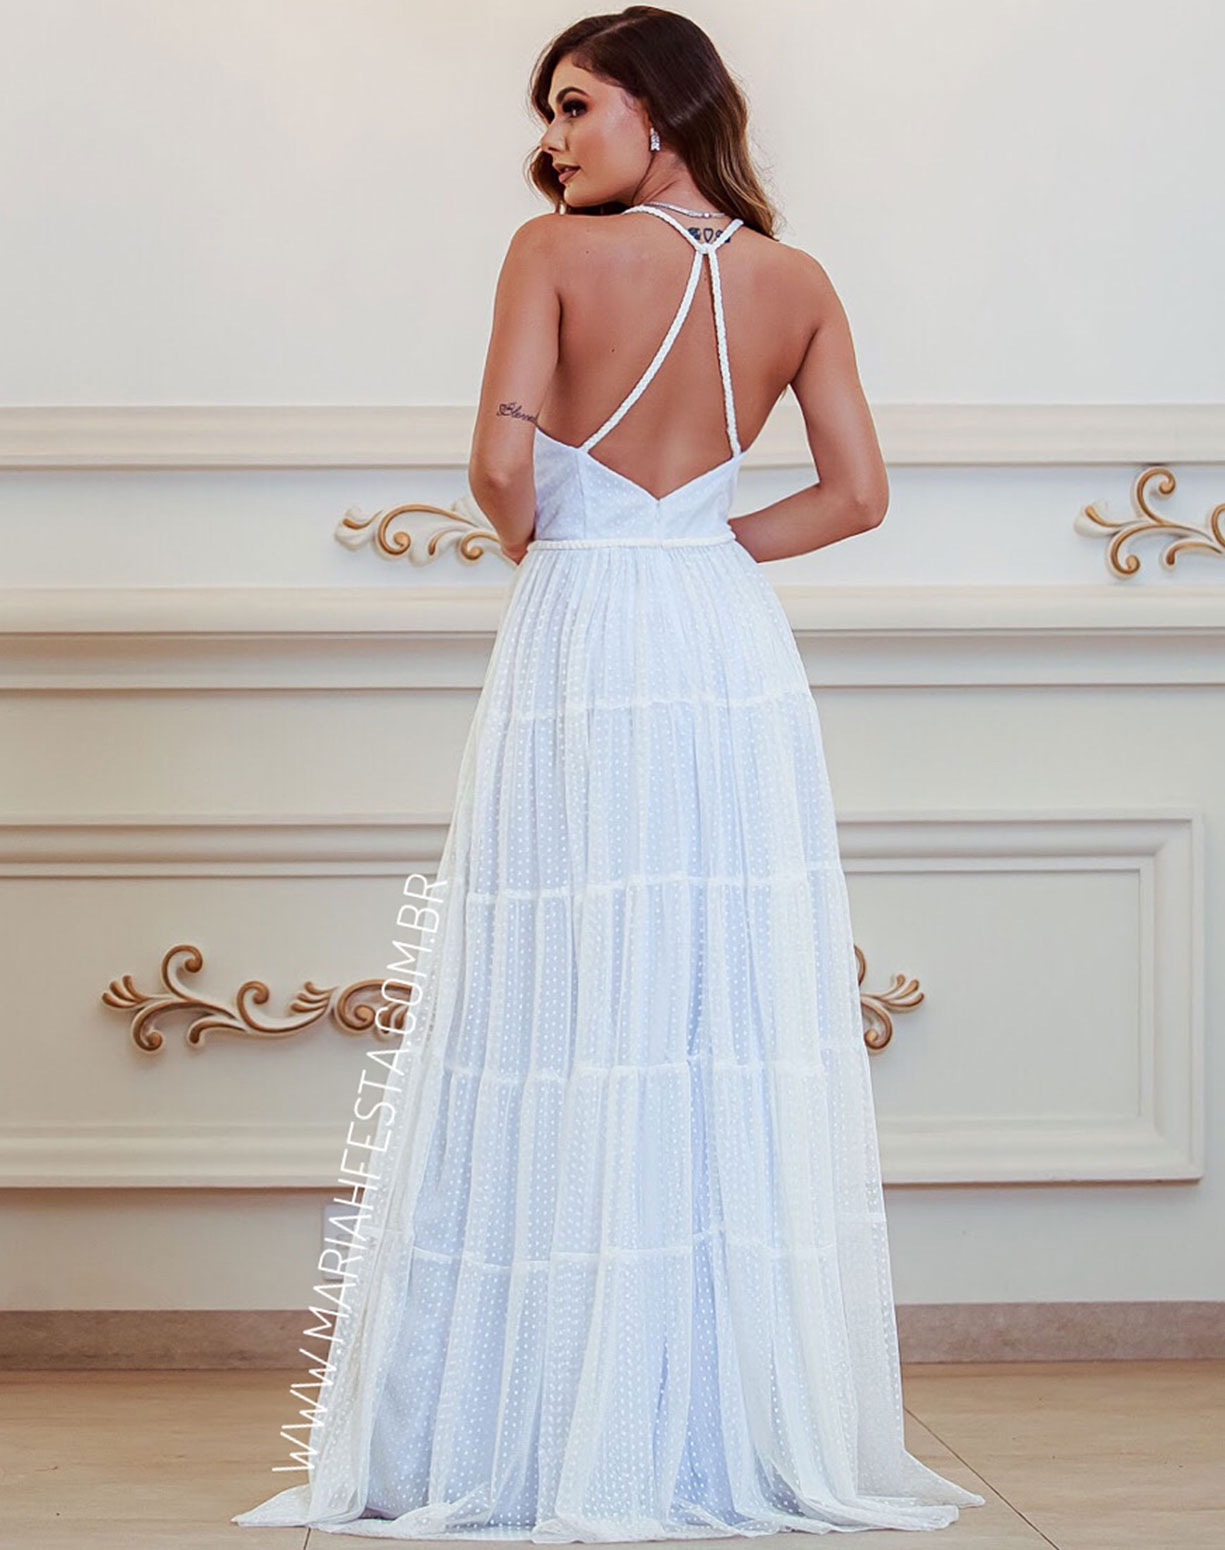 Vestido Branco em Tule Texturizado